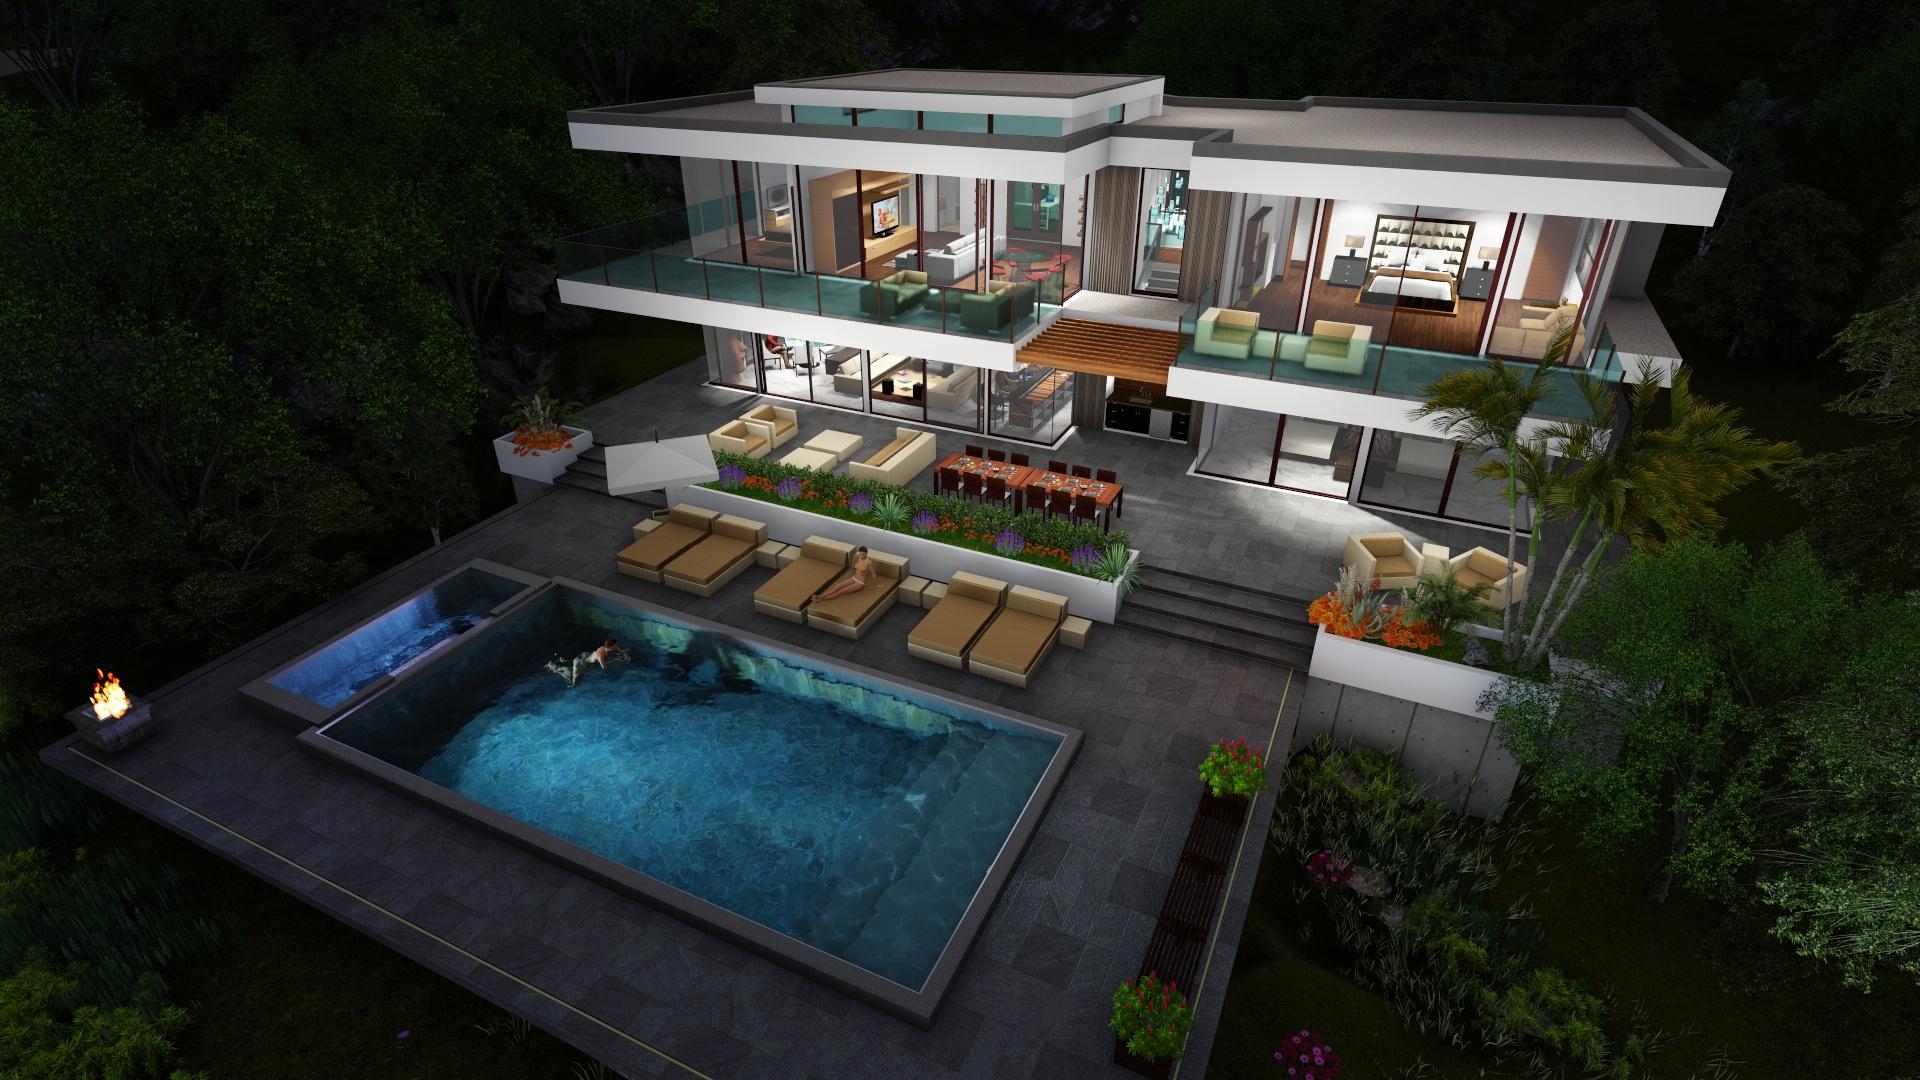 TWO STORY MODERN GLASS HOME DESIGN - Gallery - Next Gen ... on Modern Glass House Design  id=74982